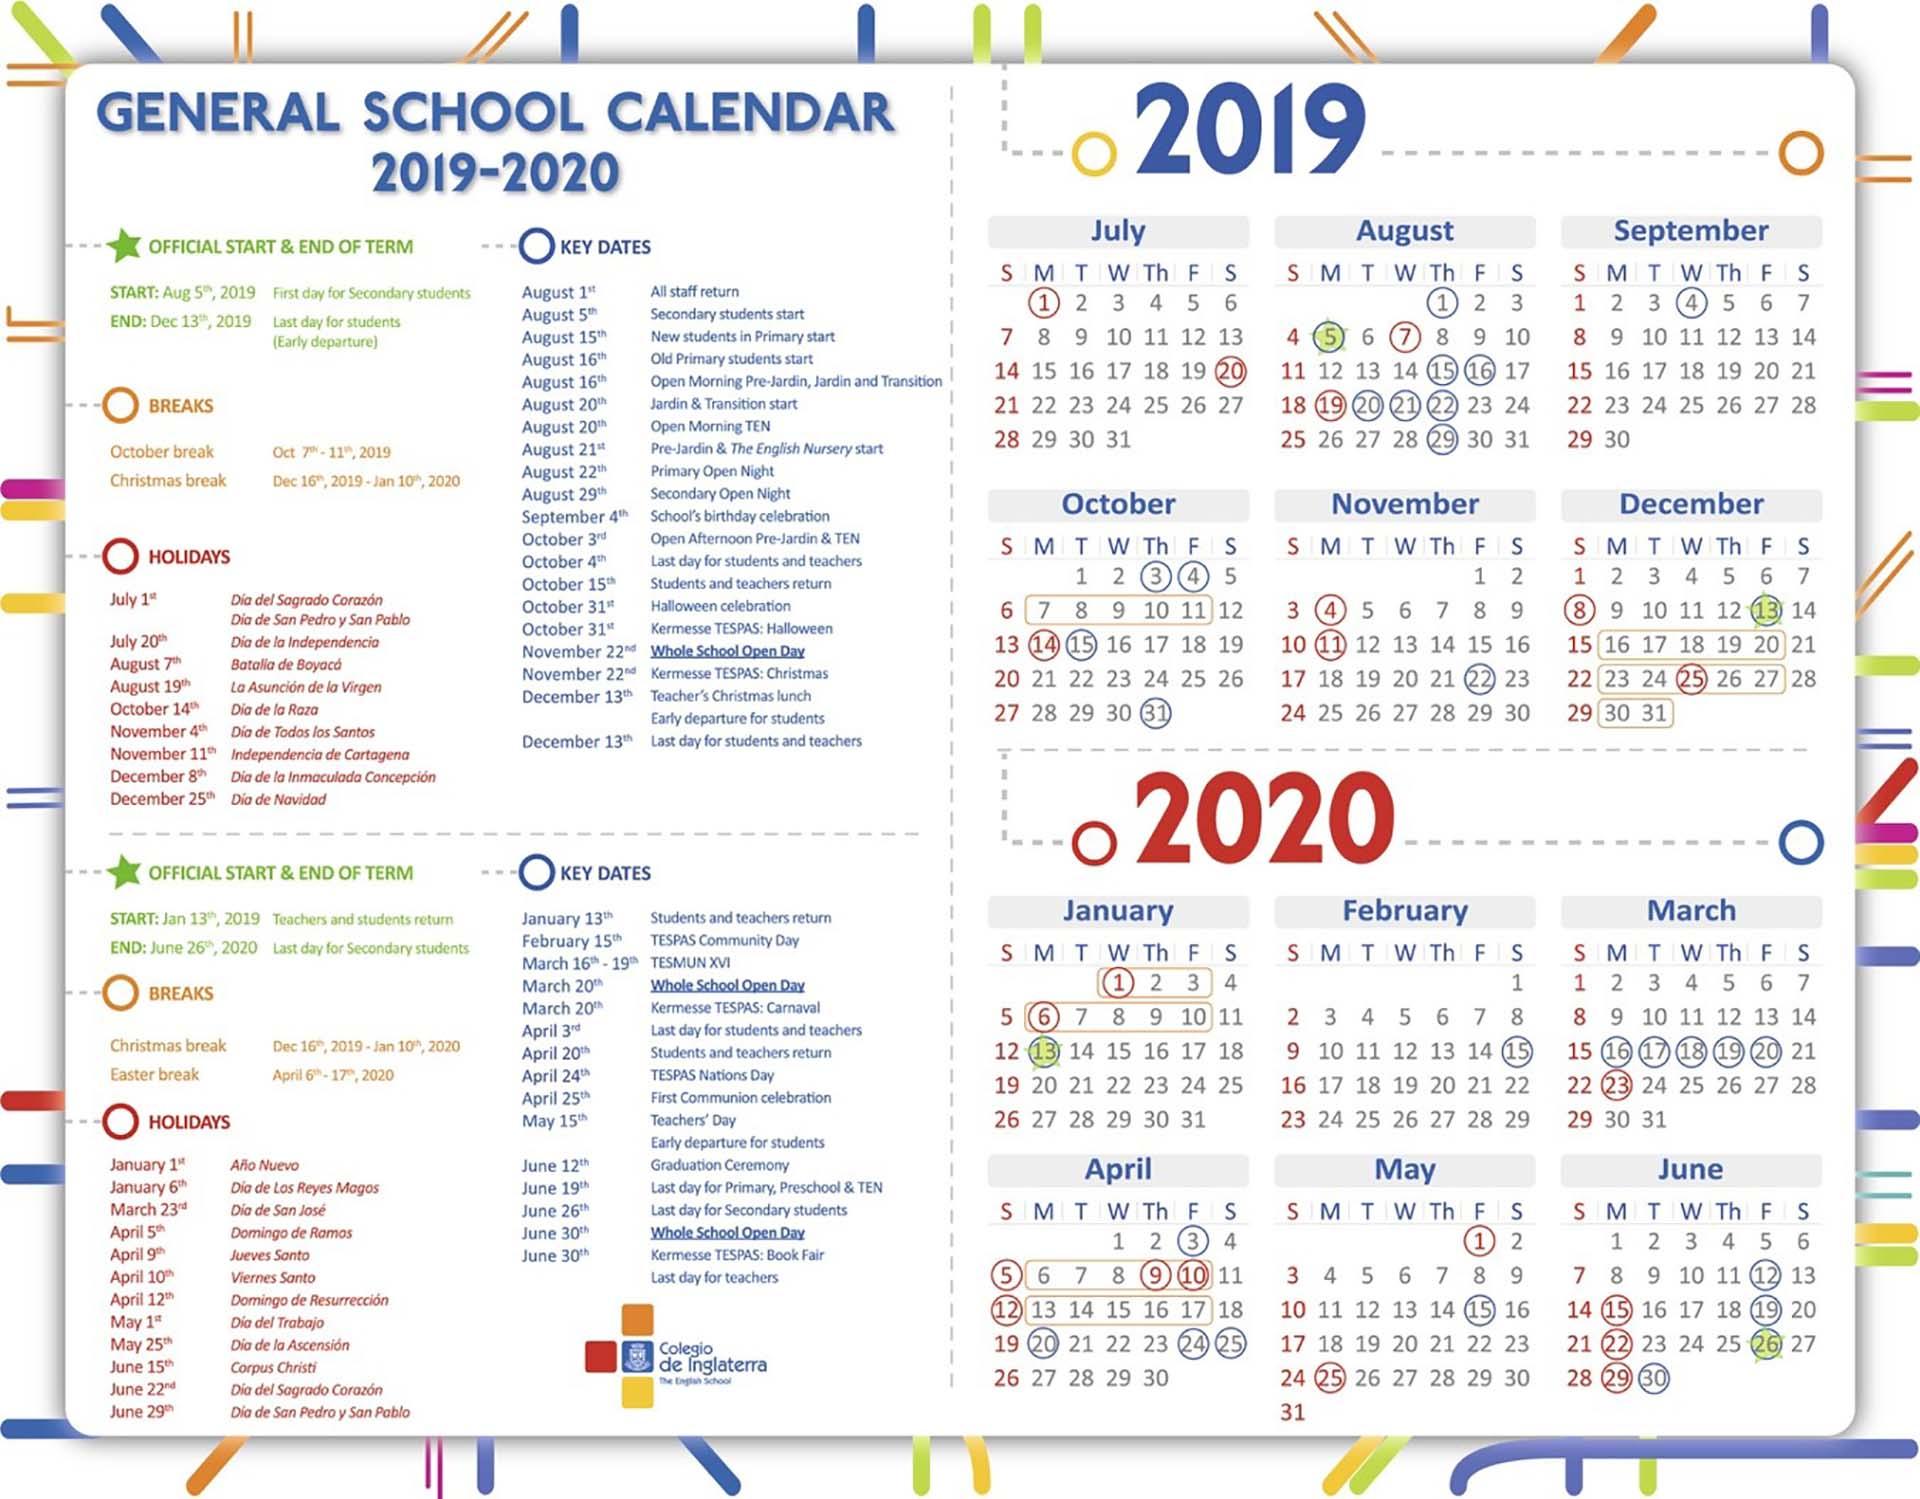 Calendario Colombia 2020 - Togo.wpart.co